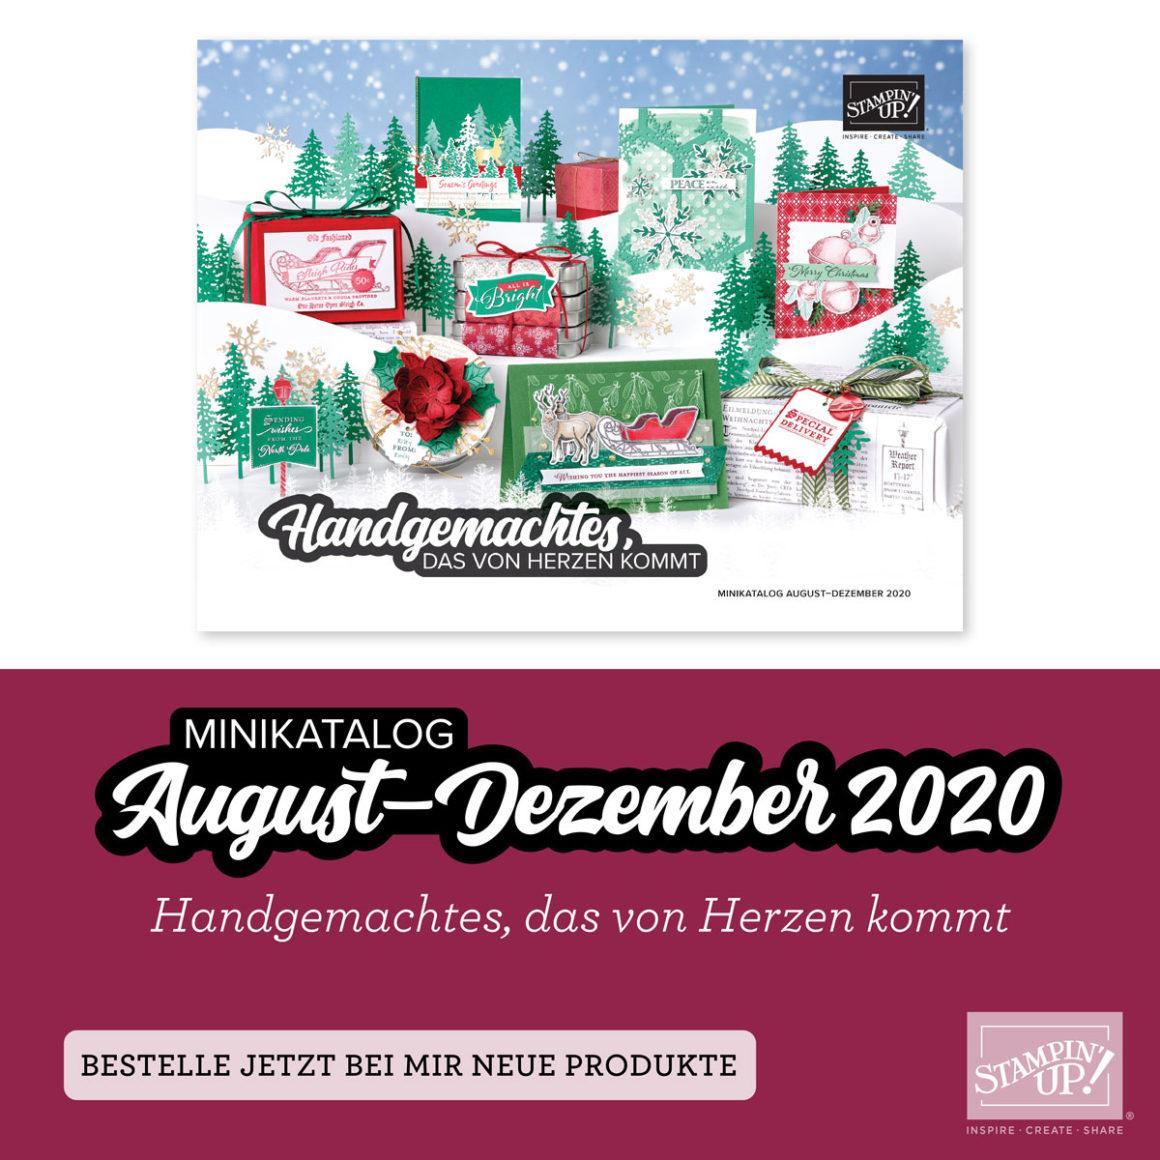 Stampin' Up! Saisonkatalog Herbst/Winter 2020